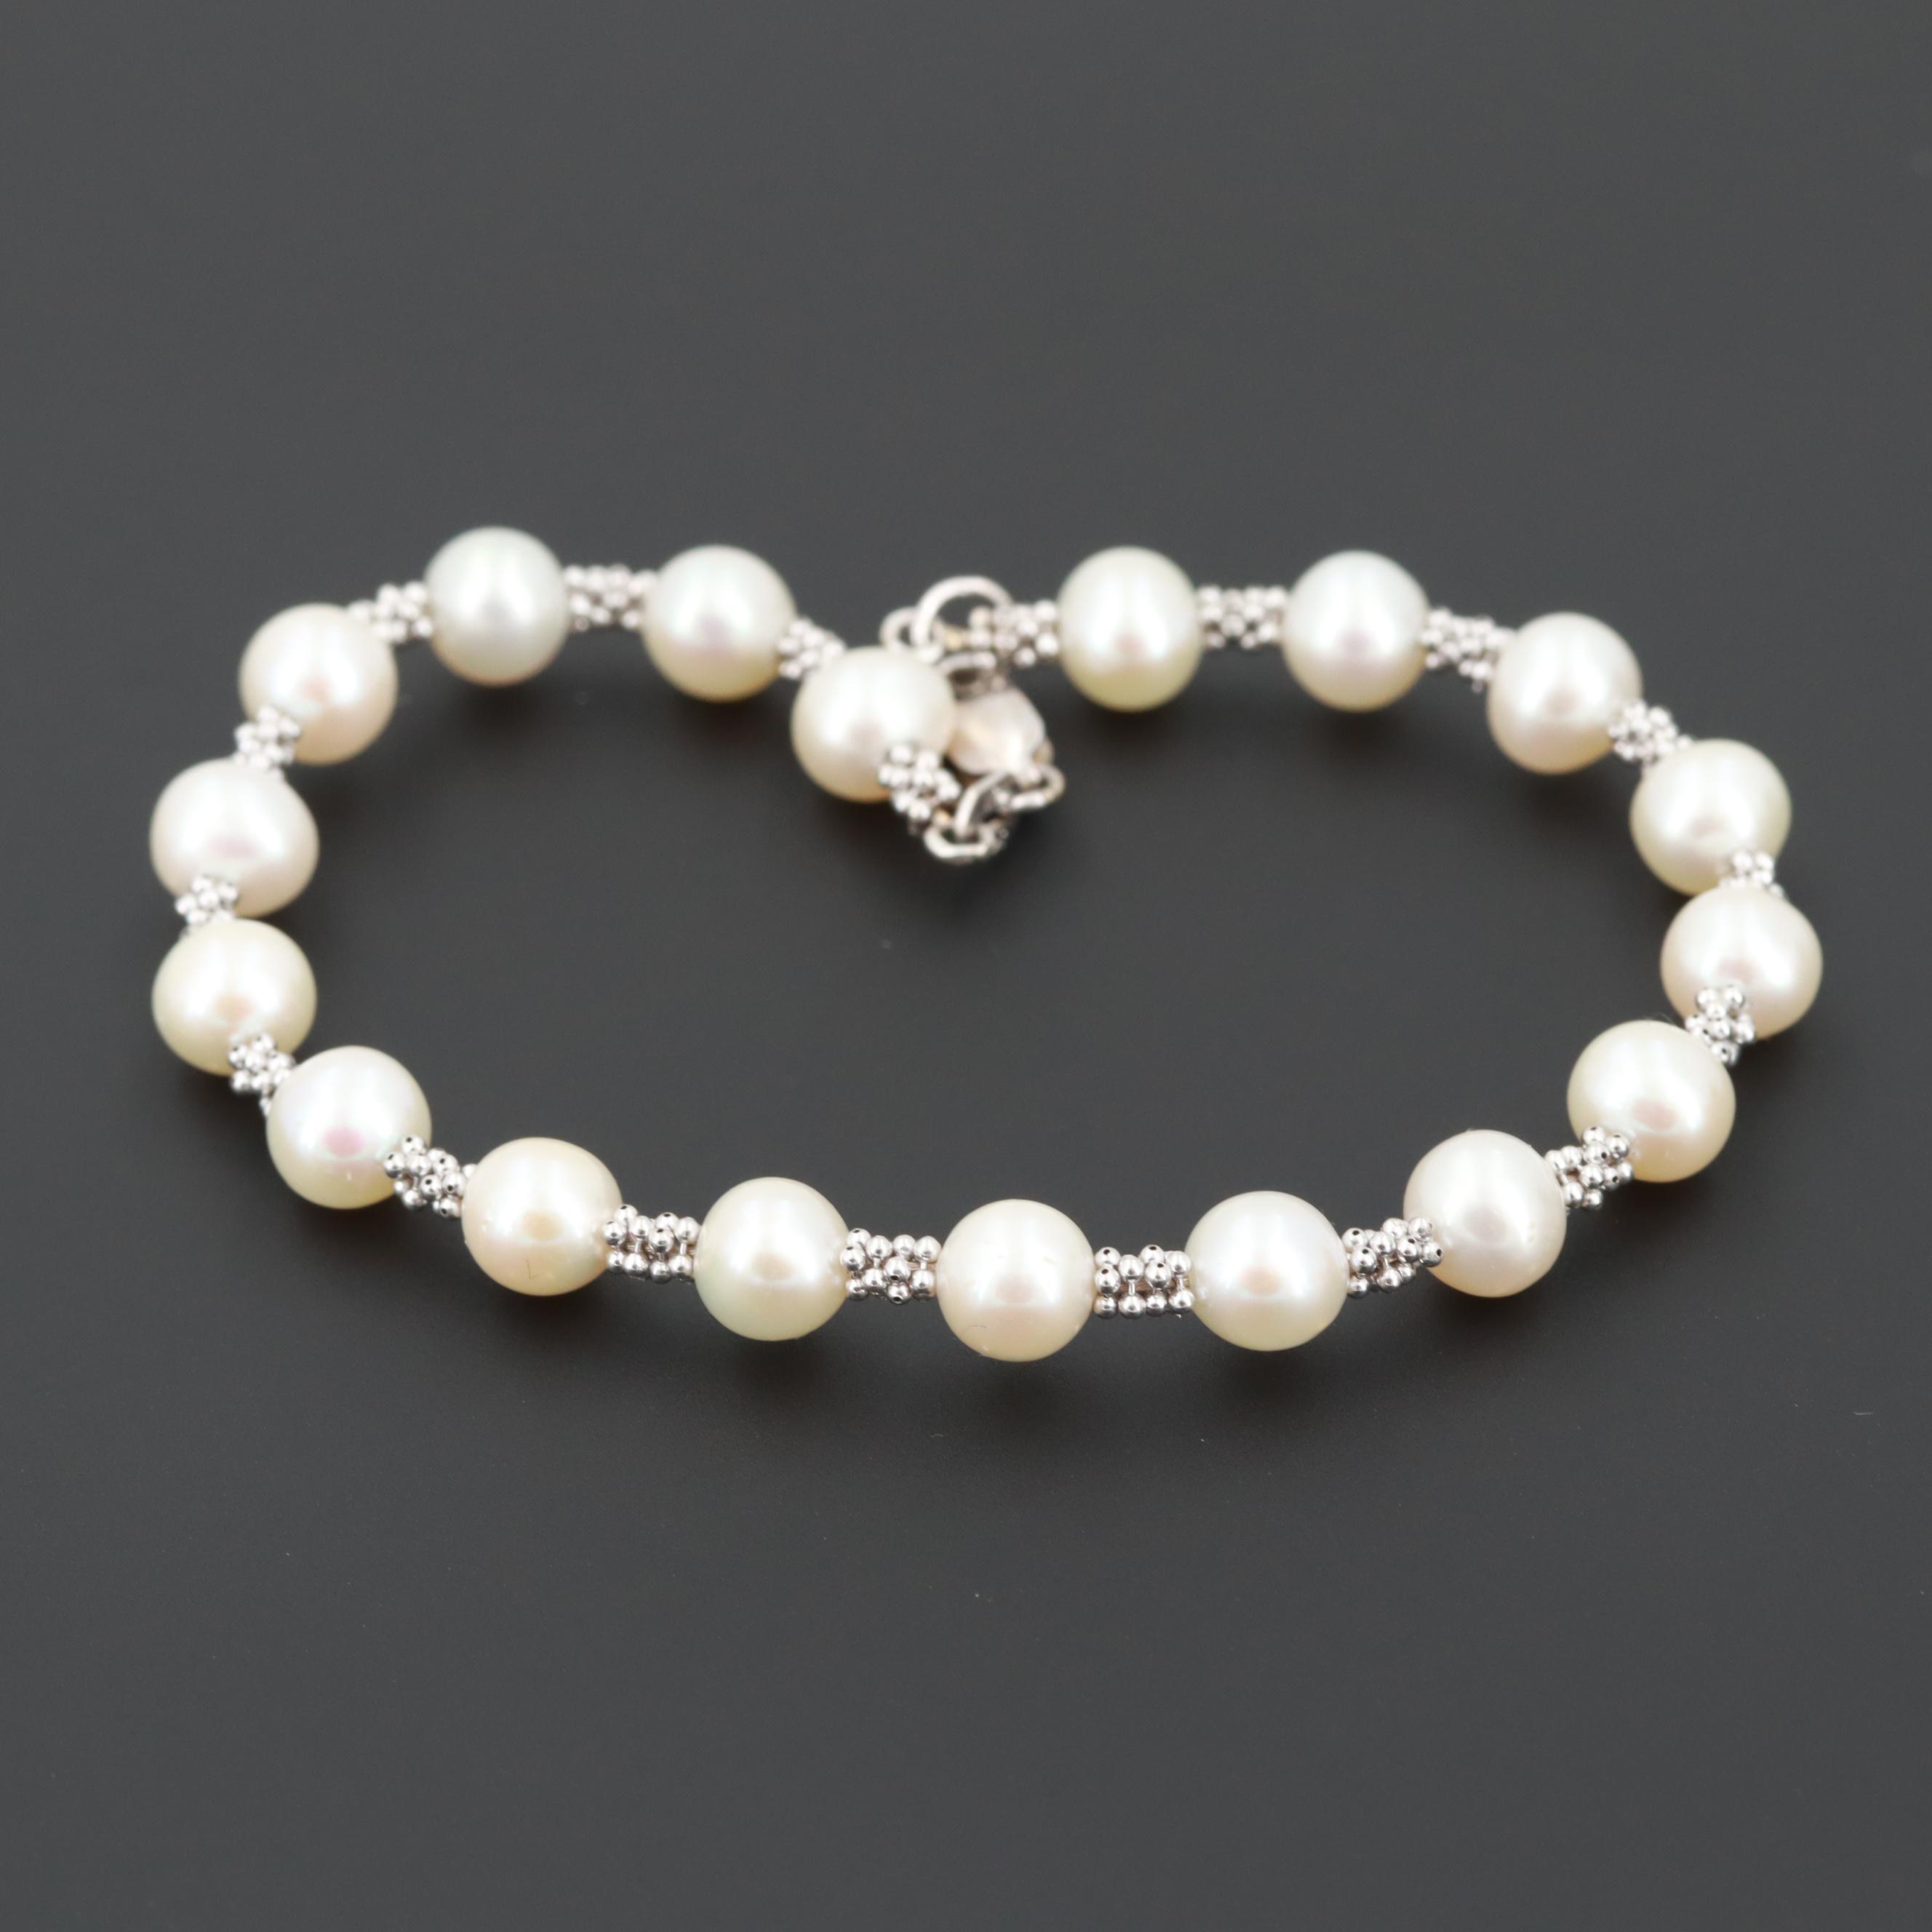 14K White Gold Cultured Pearl Bracelet